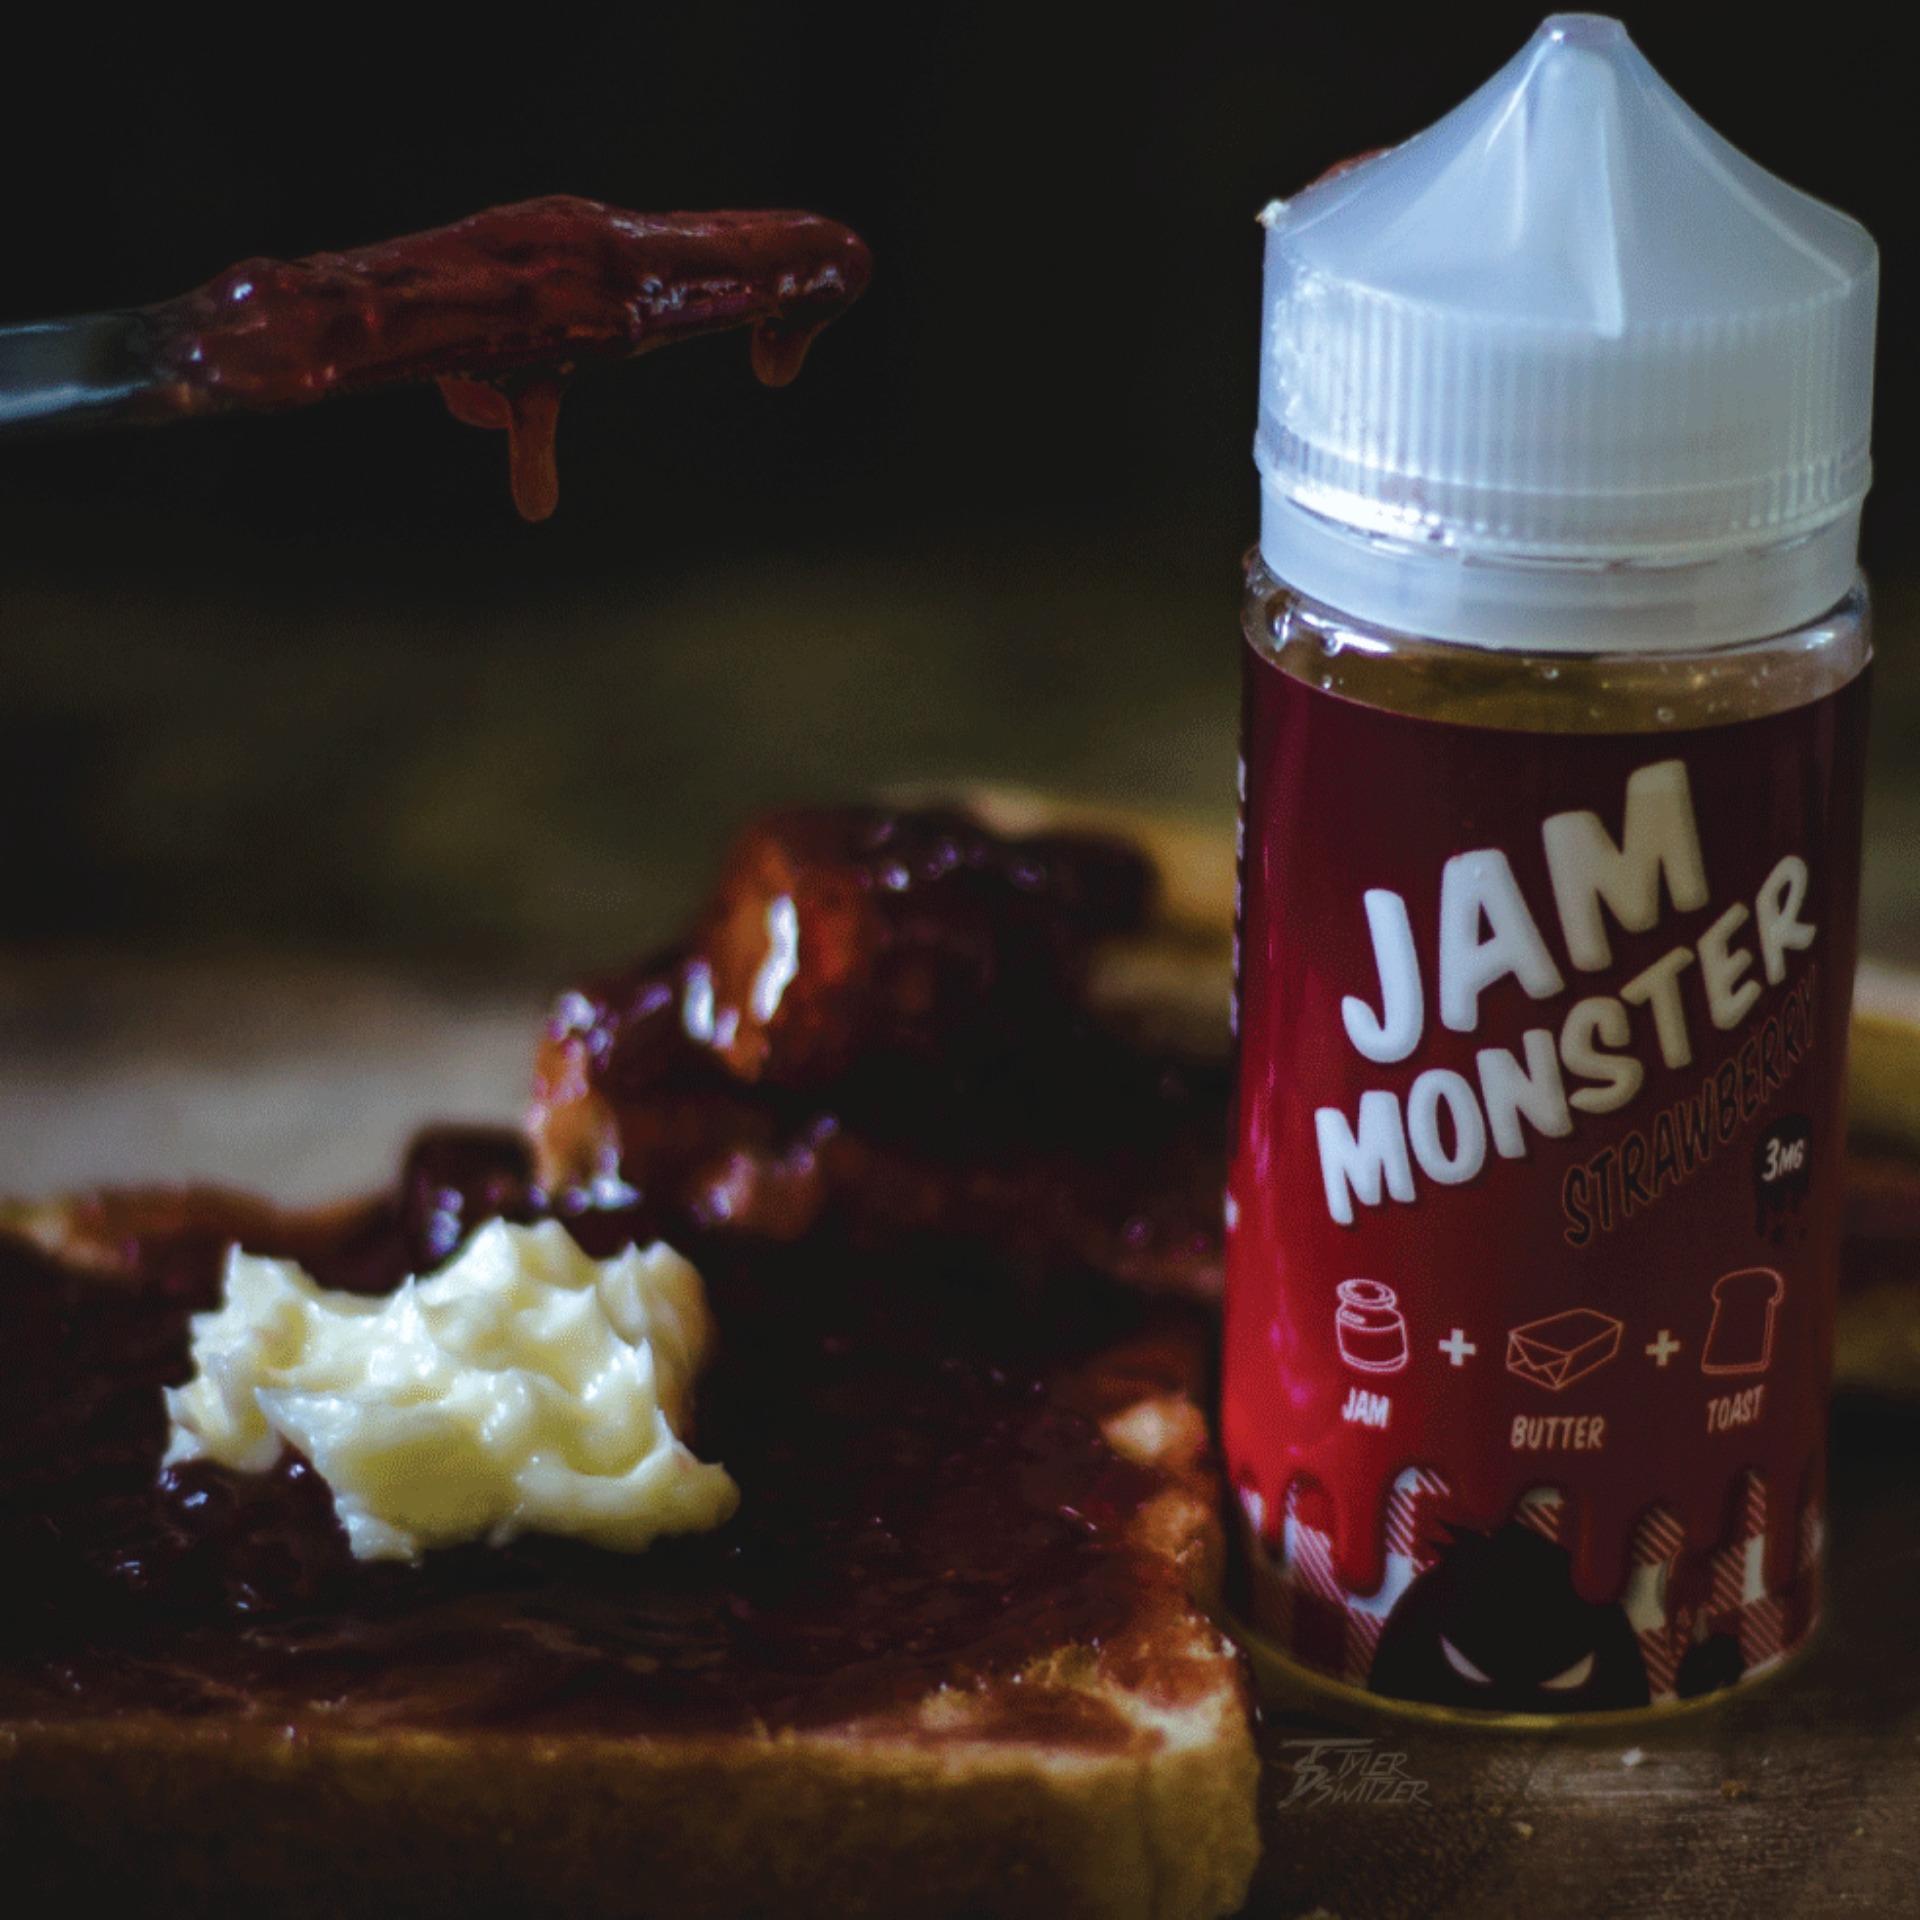 Terbaik Murah Best Premiium Liquid Usa Vape Vapor Vaporizer Giant E Selai Strawberry Eliquid Jam Monster Roti